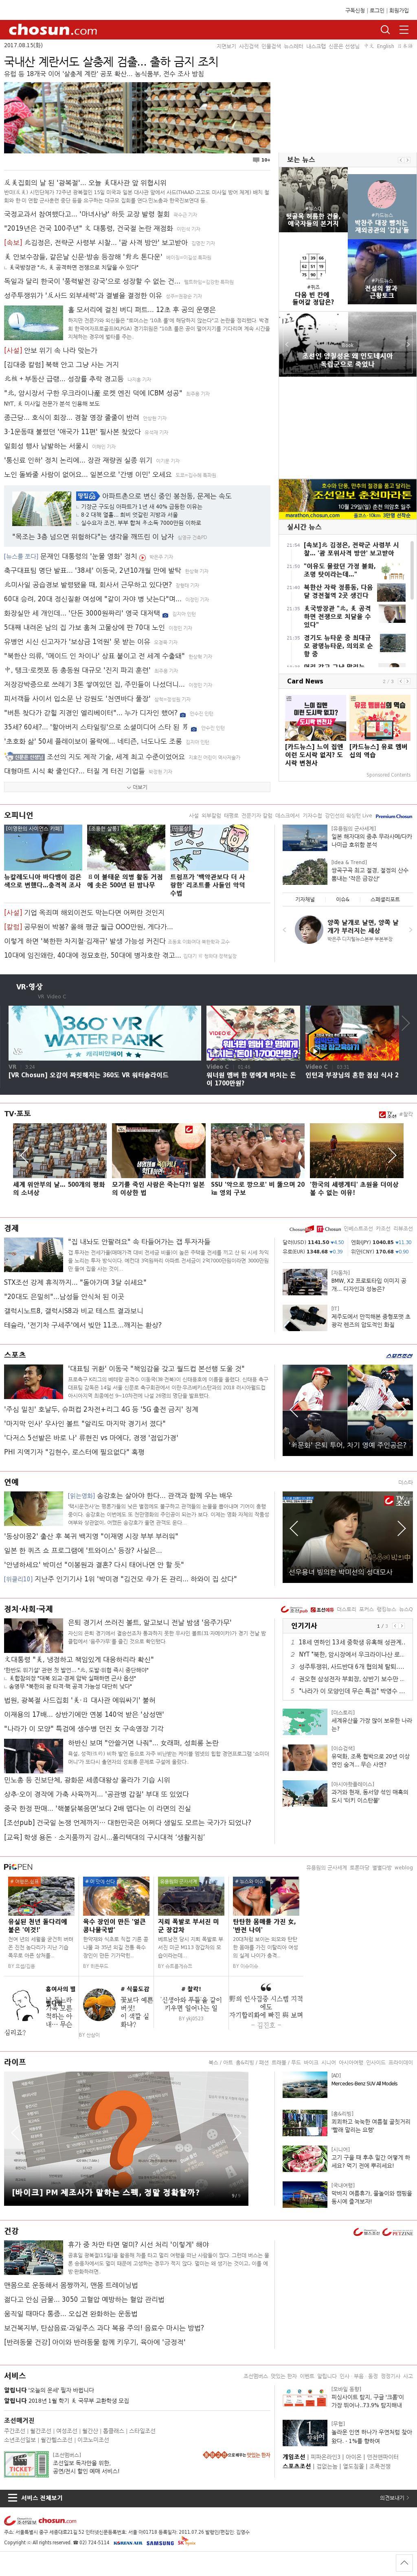 chosun.com at Monday Aug. 14, 2017, 10:02 p.m. UTC